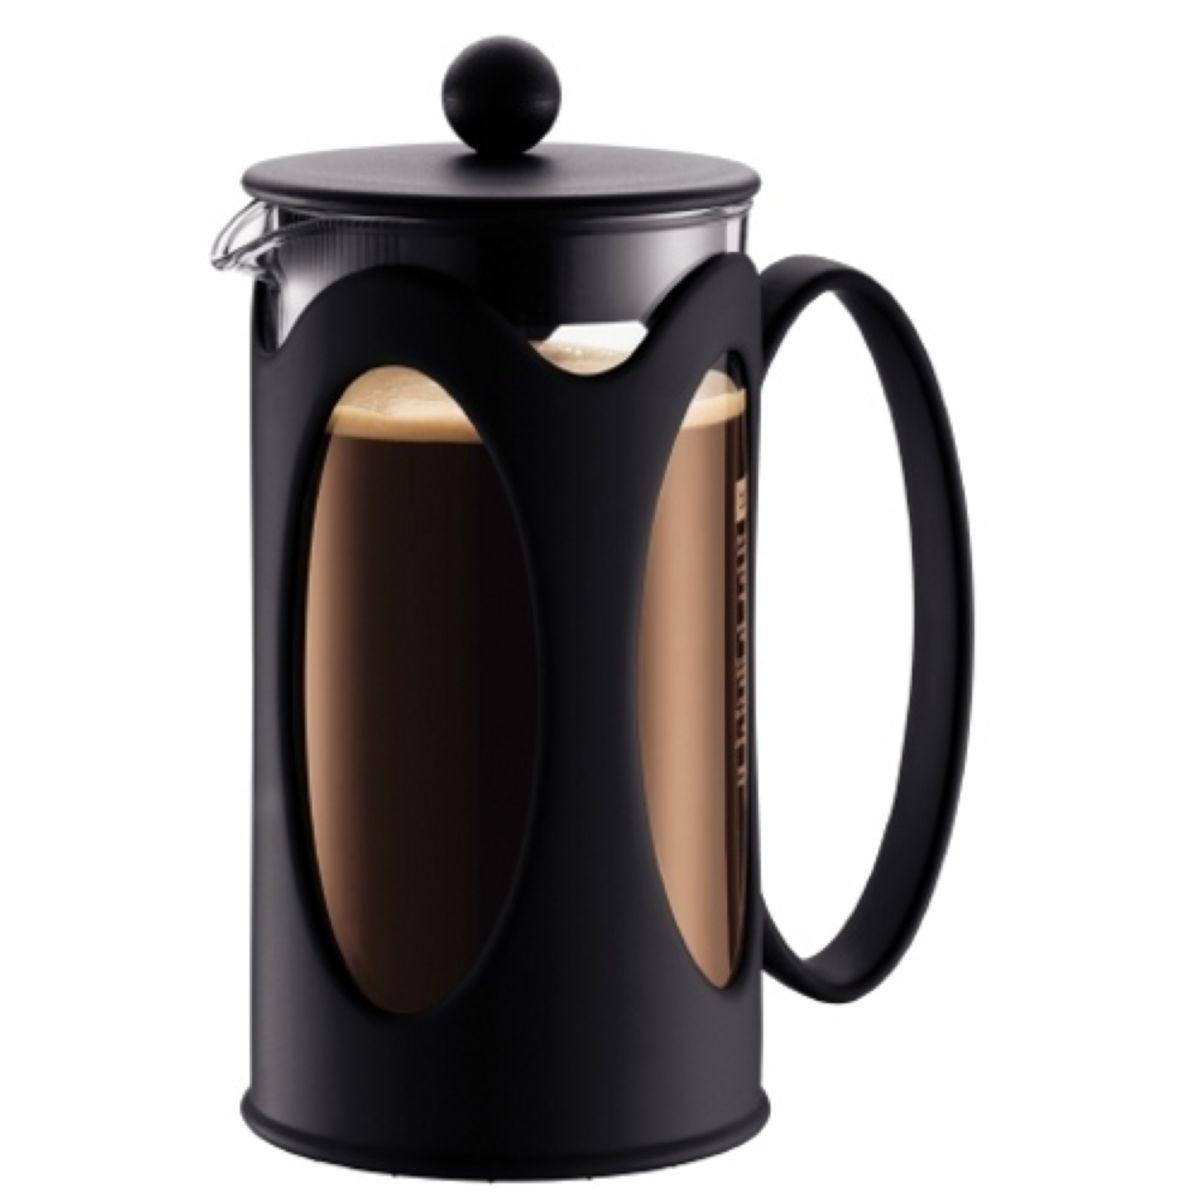 Bodum 8 Cup Kenya Coffee Maker